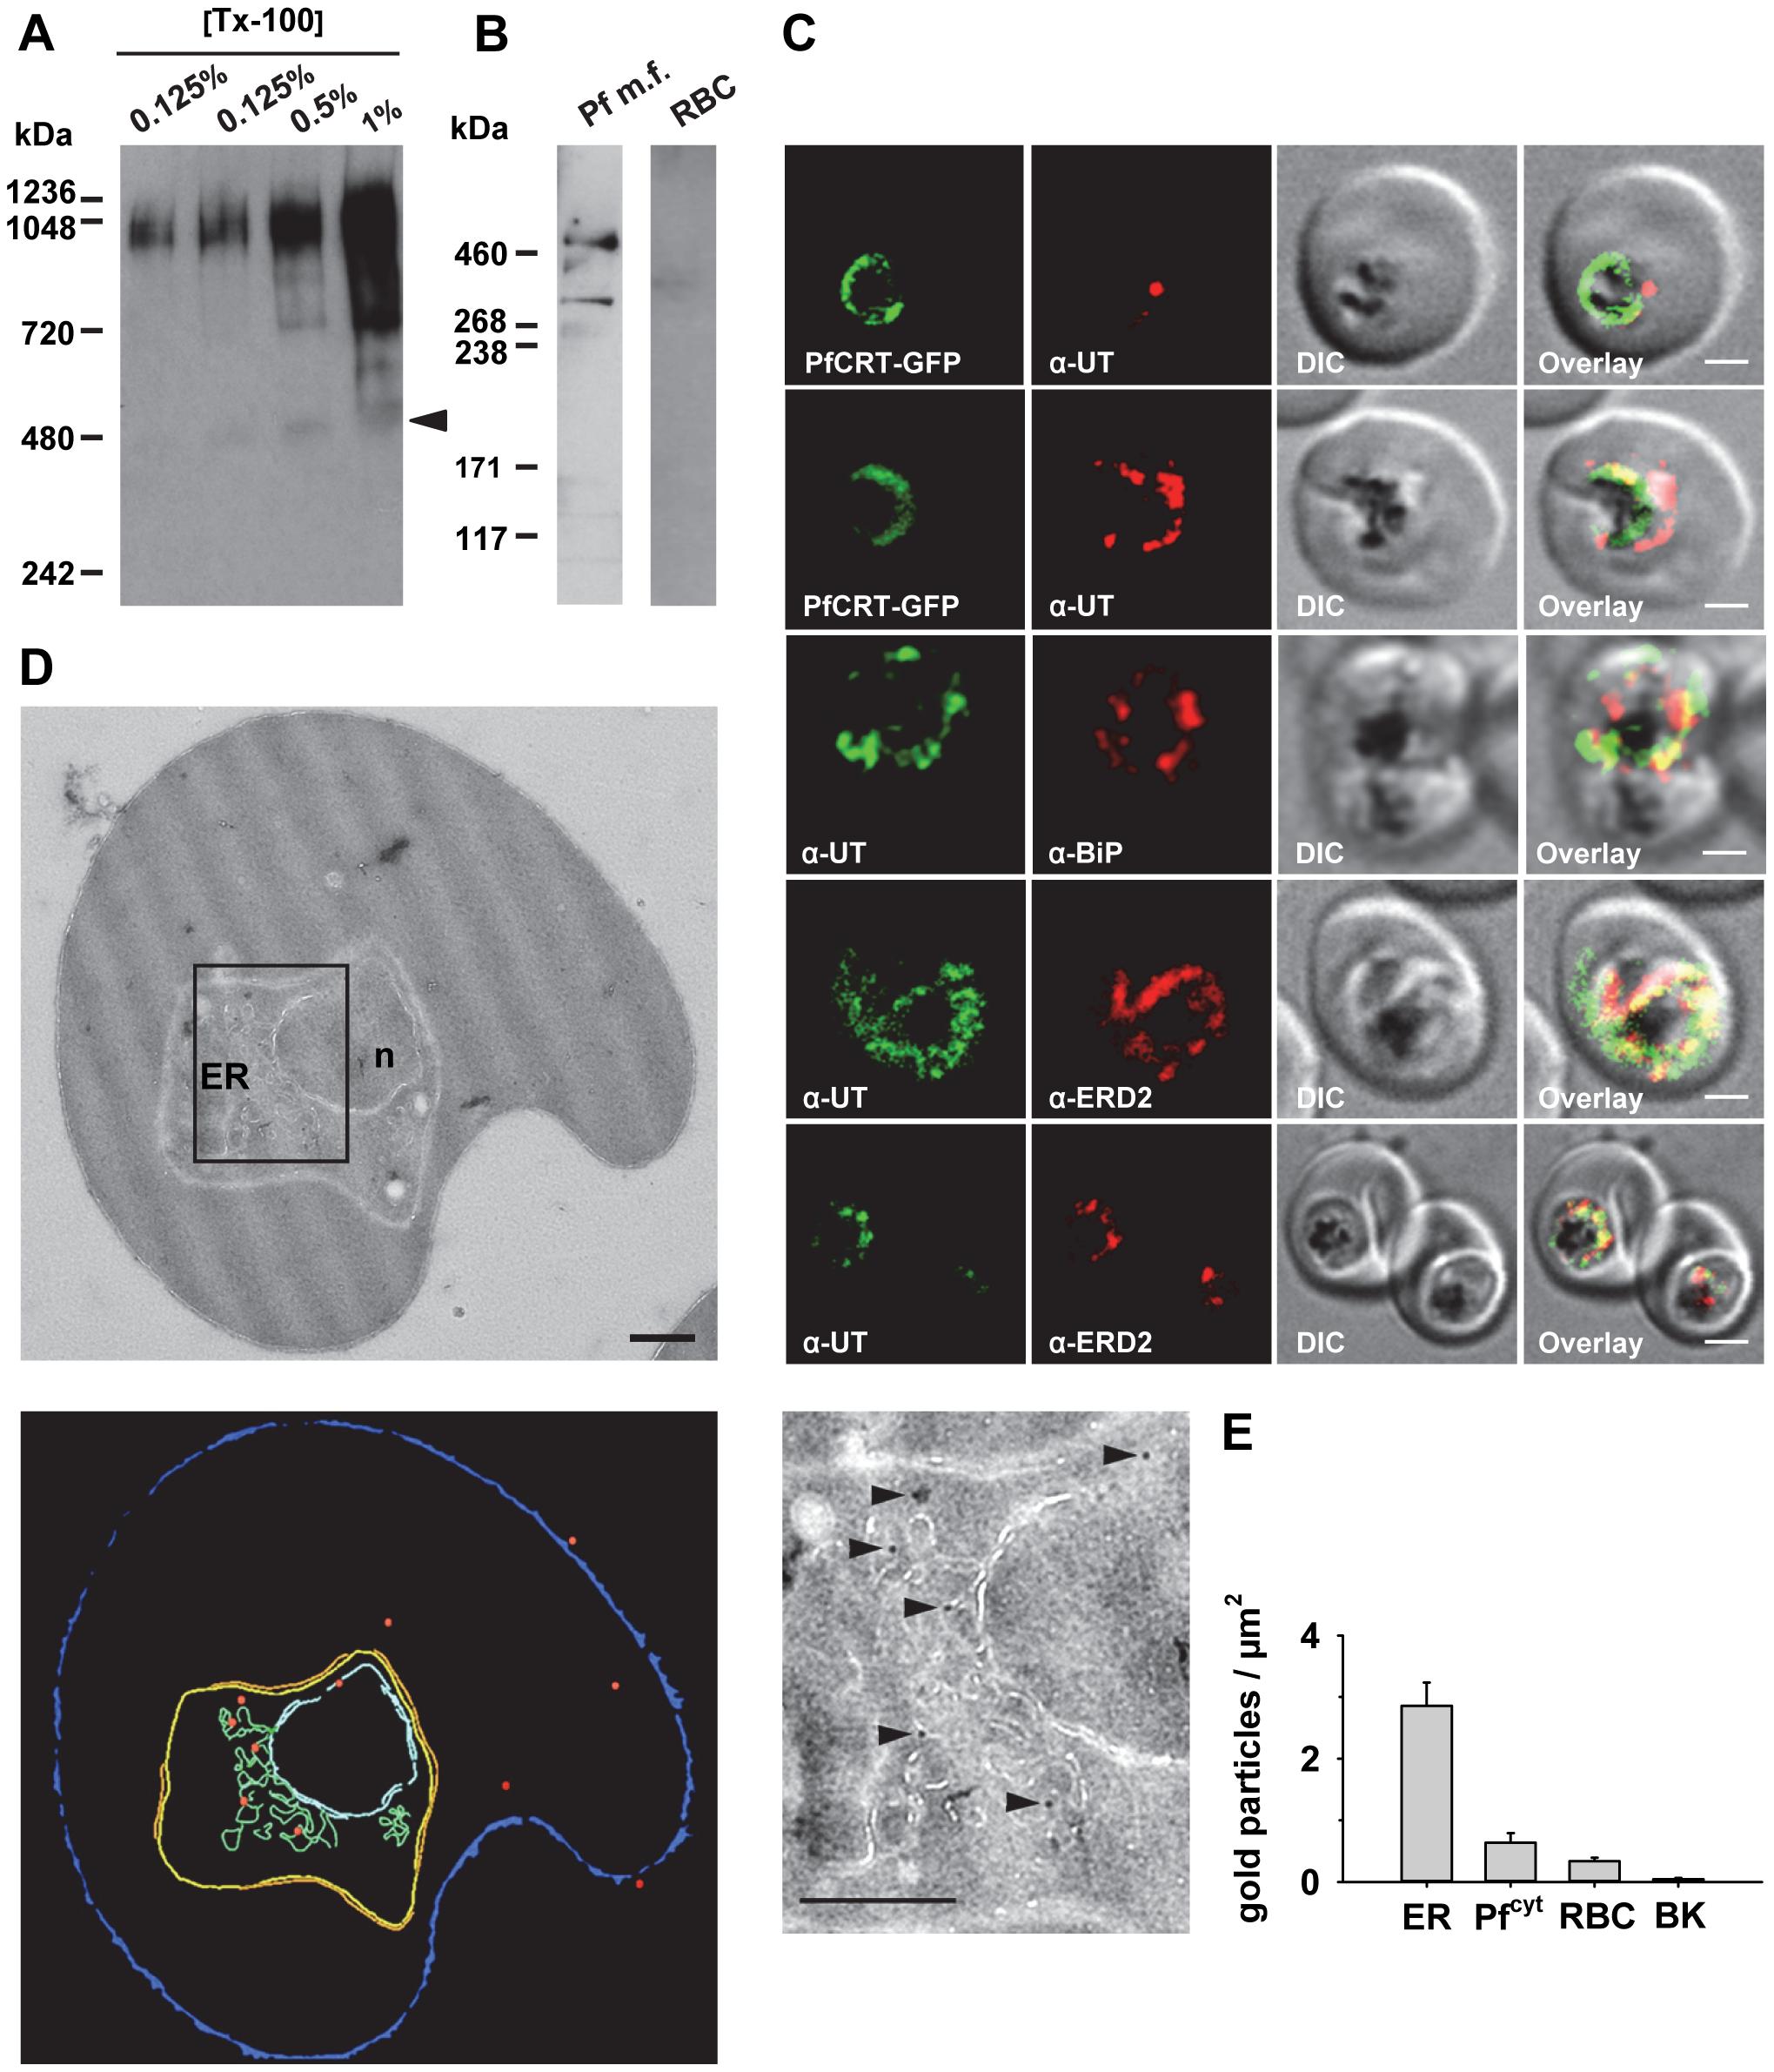 HECT ubiquitin-protein ligase (PfUT) localizes to the ER/Golgi complex.